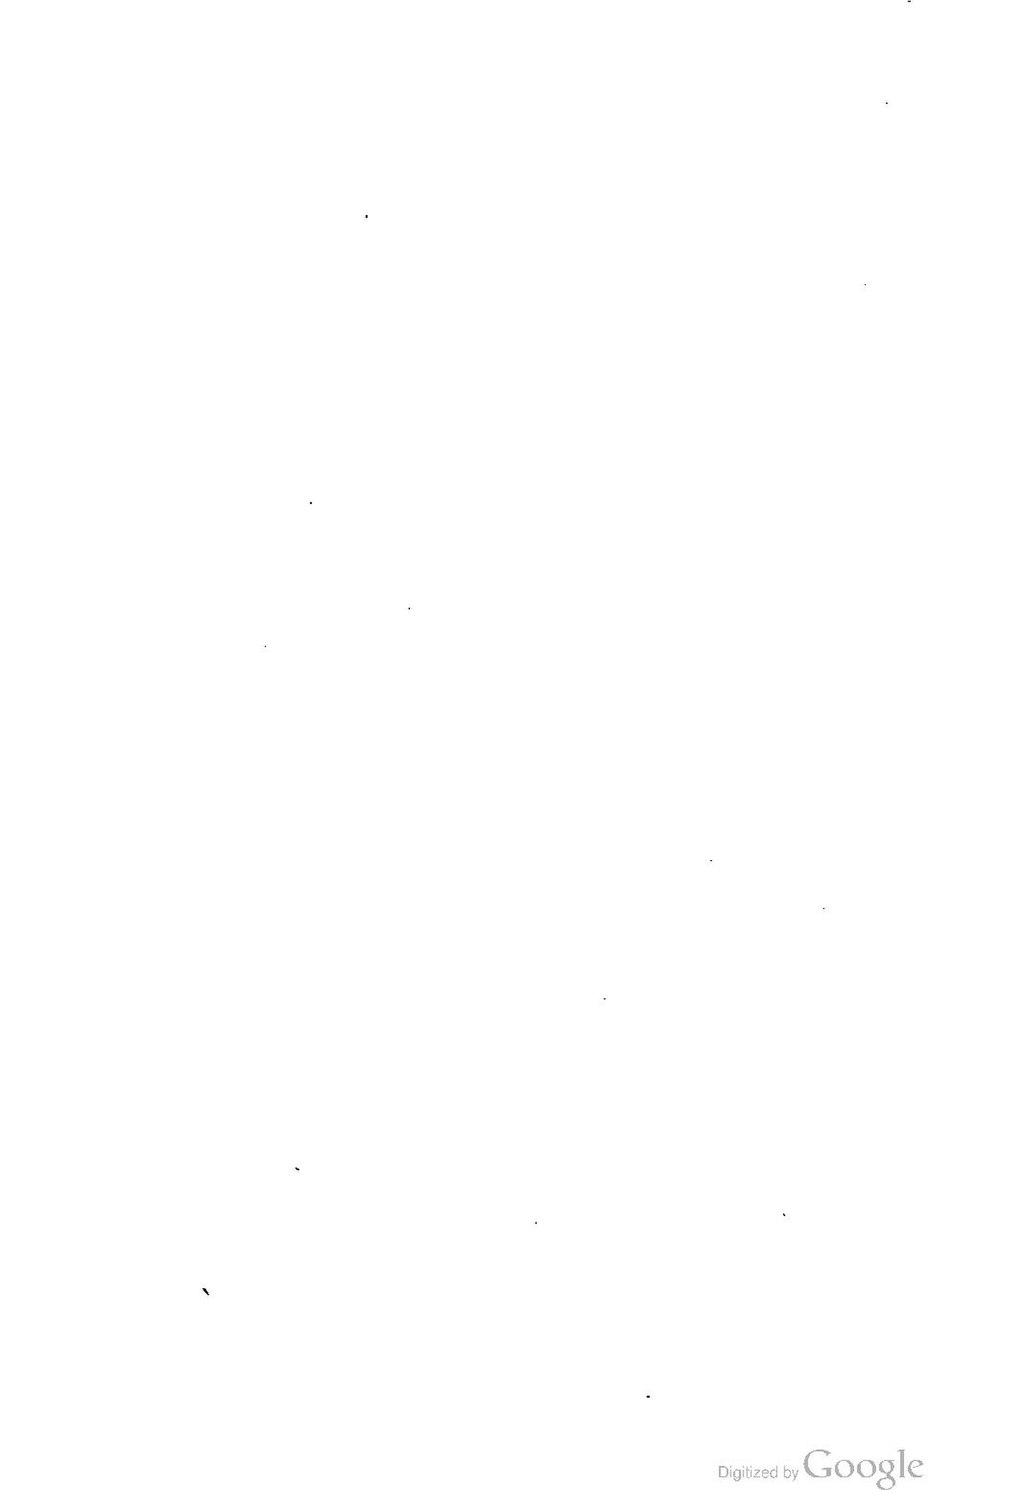 Dante pdf purgatorio